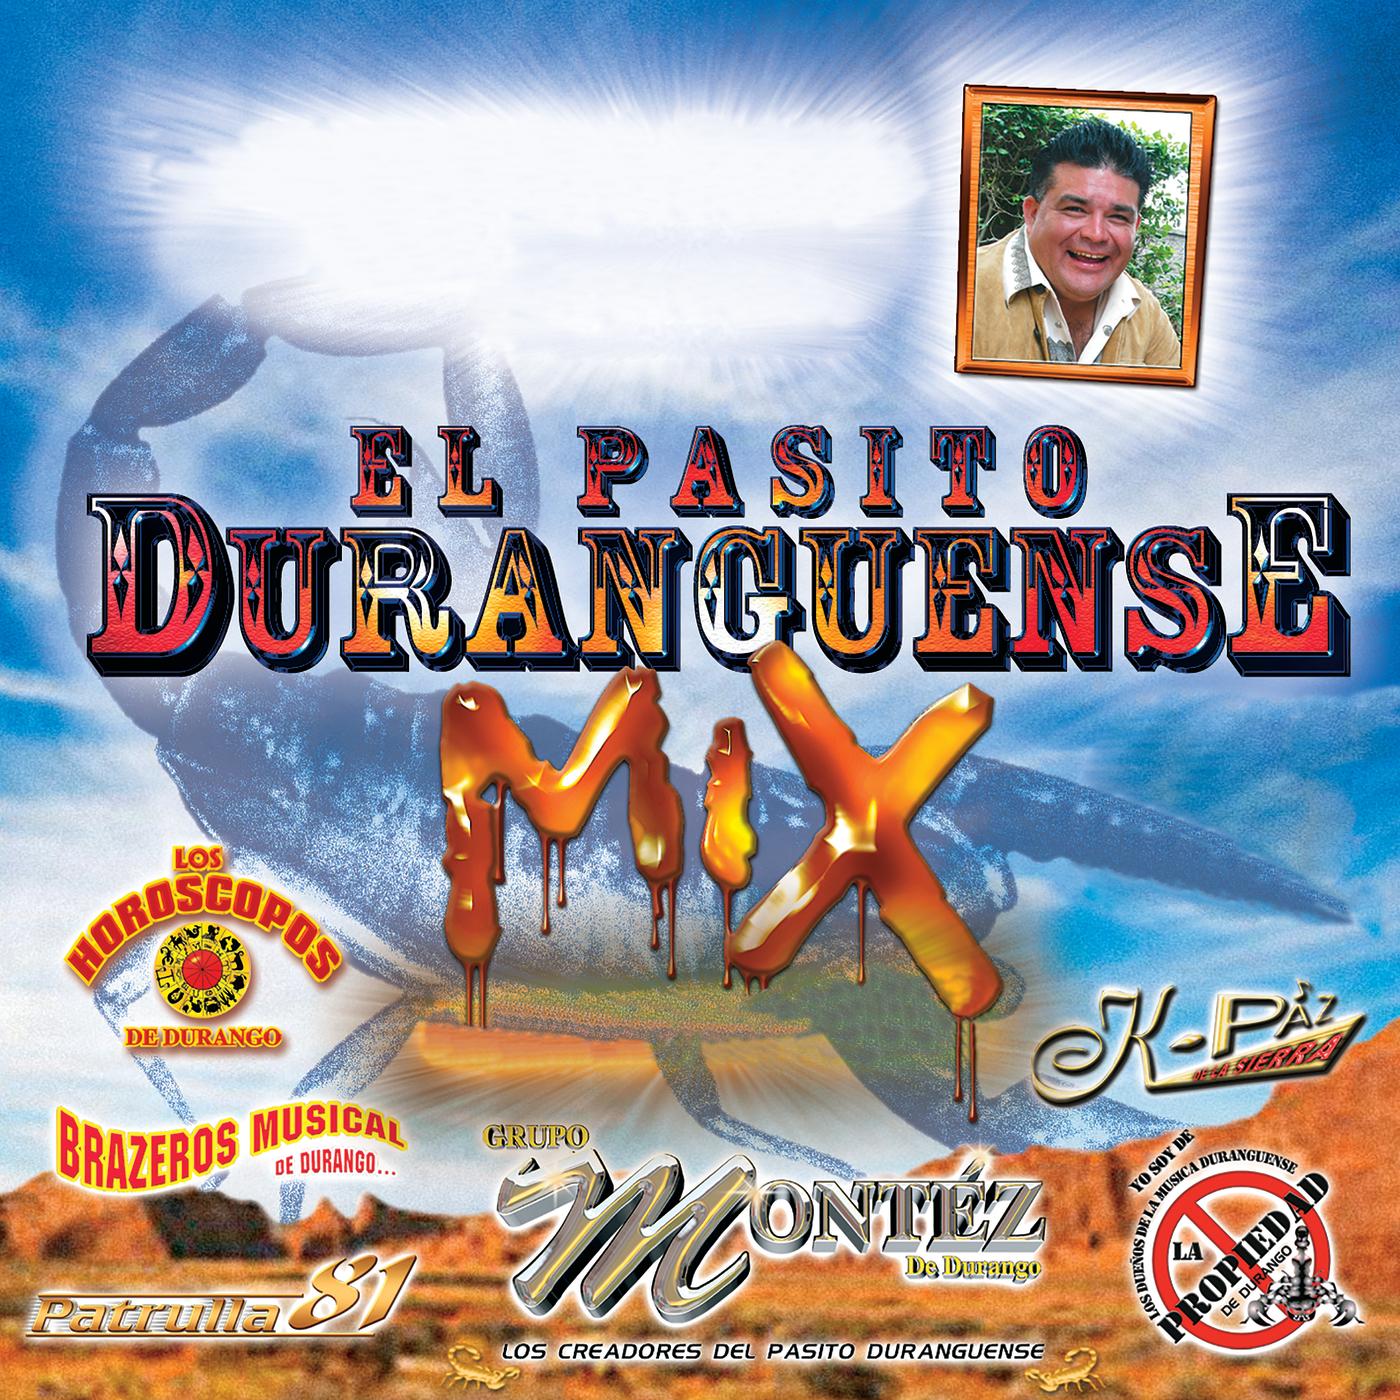 Listen Free To Brazeros Musical De Durango Los Chismes Radio